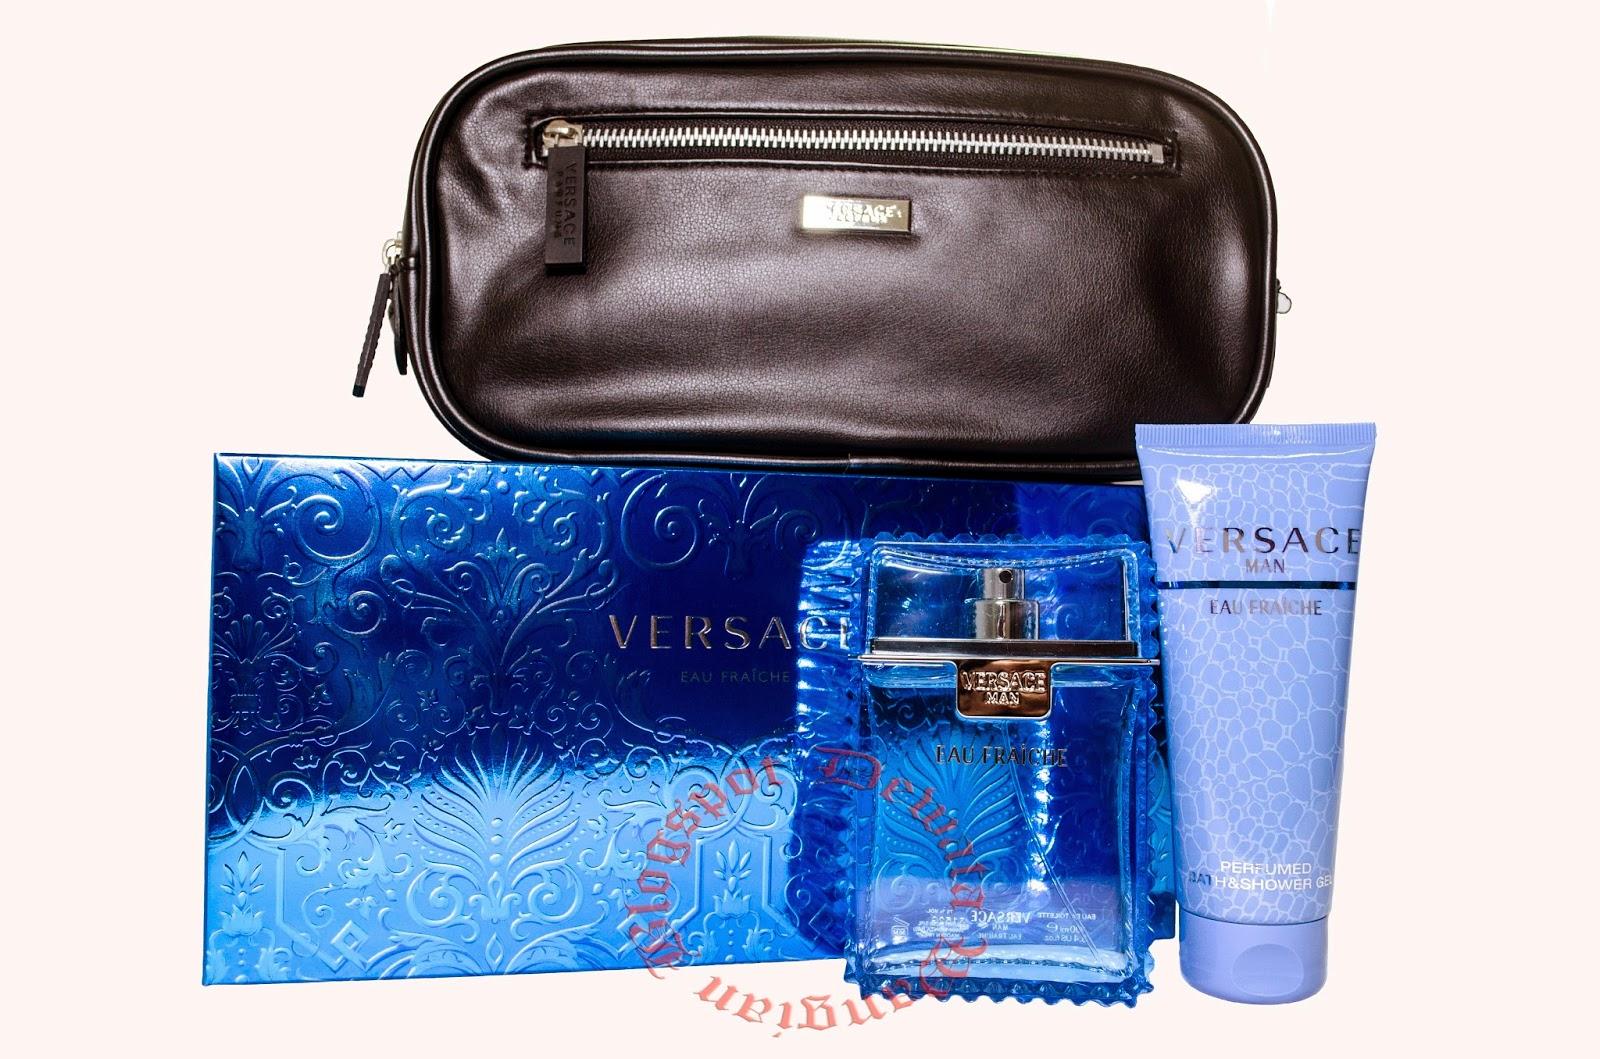 c42958265dc8 Versace Eau Fraiche Gift Set